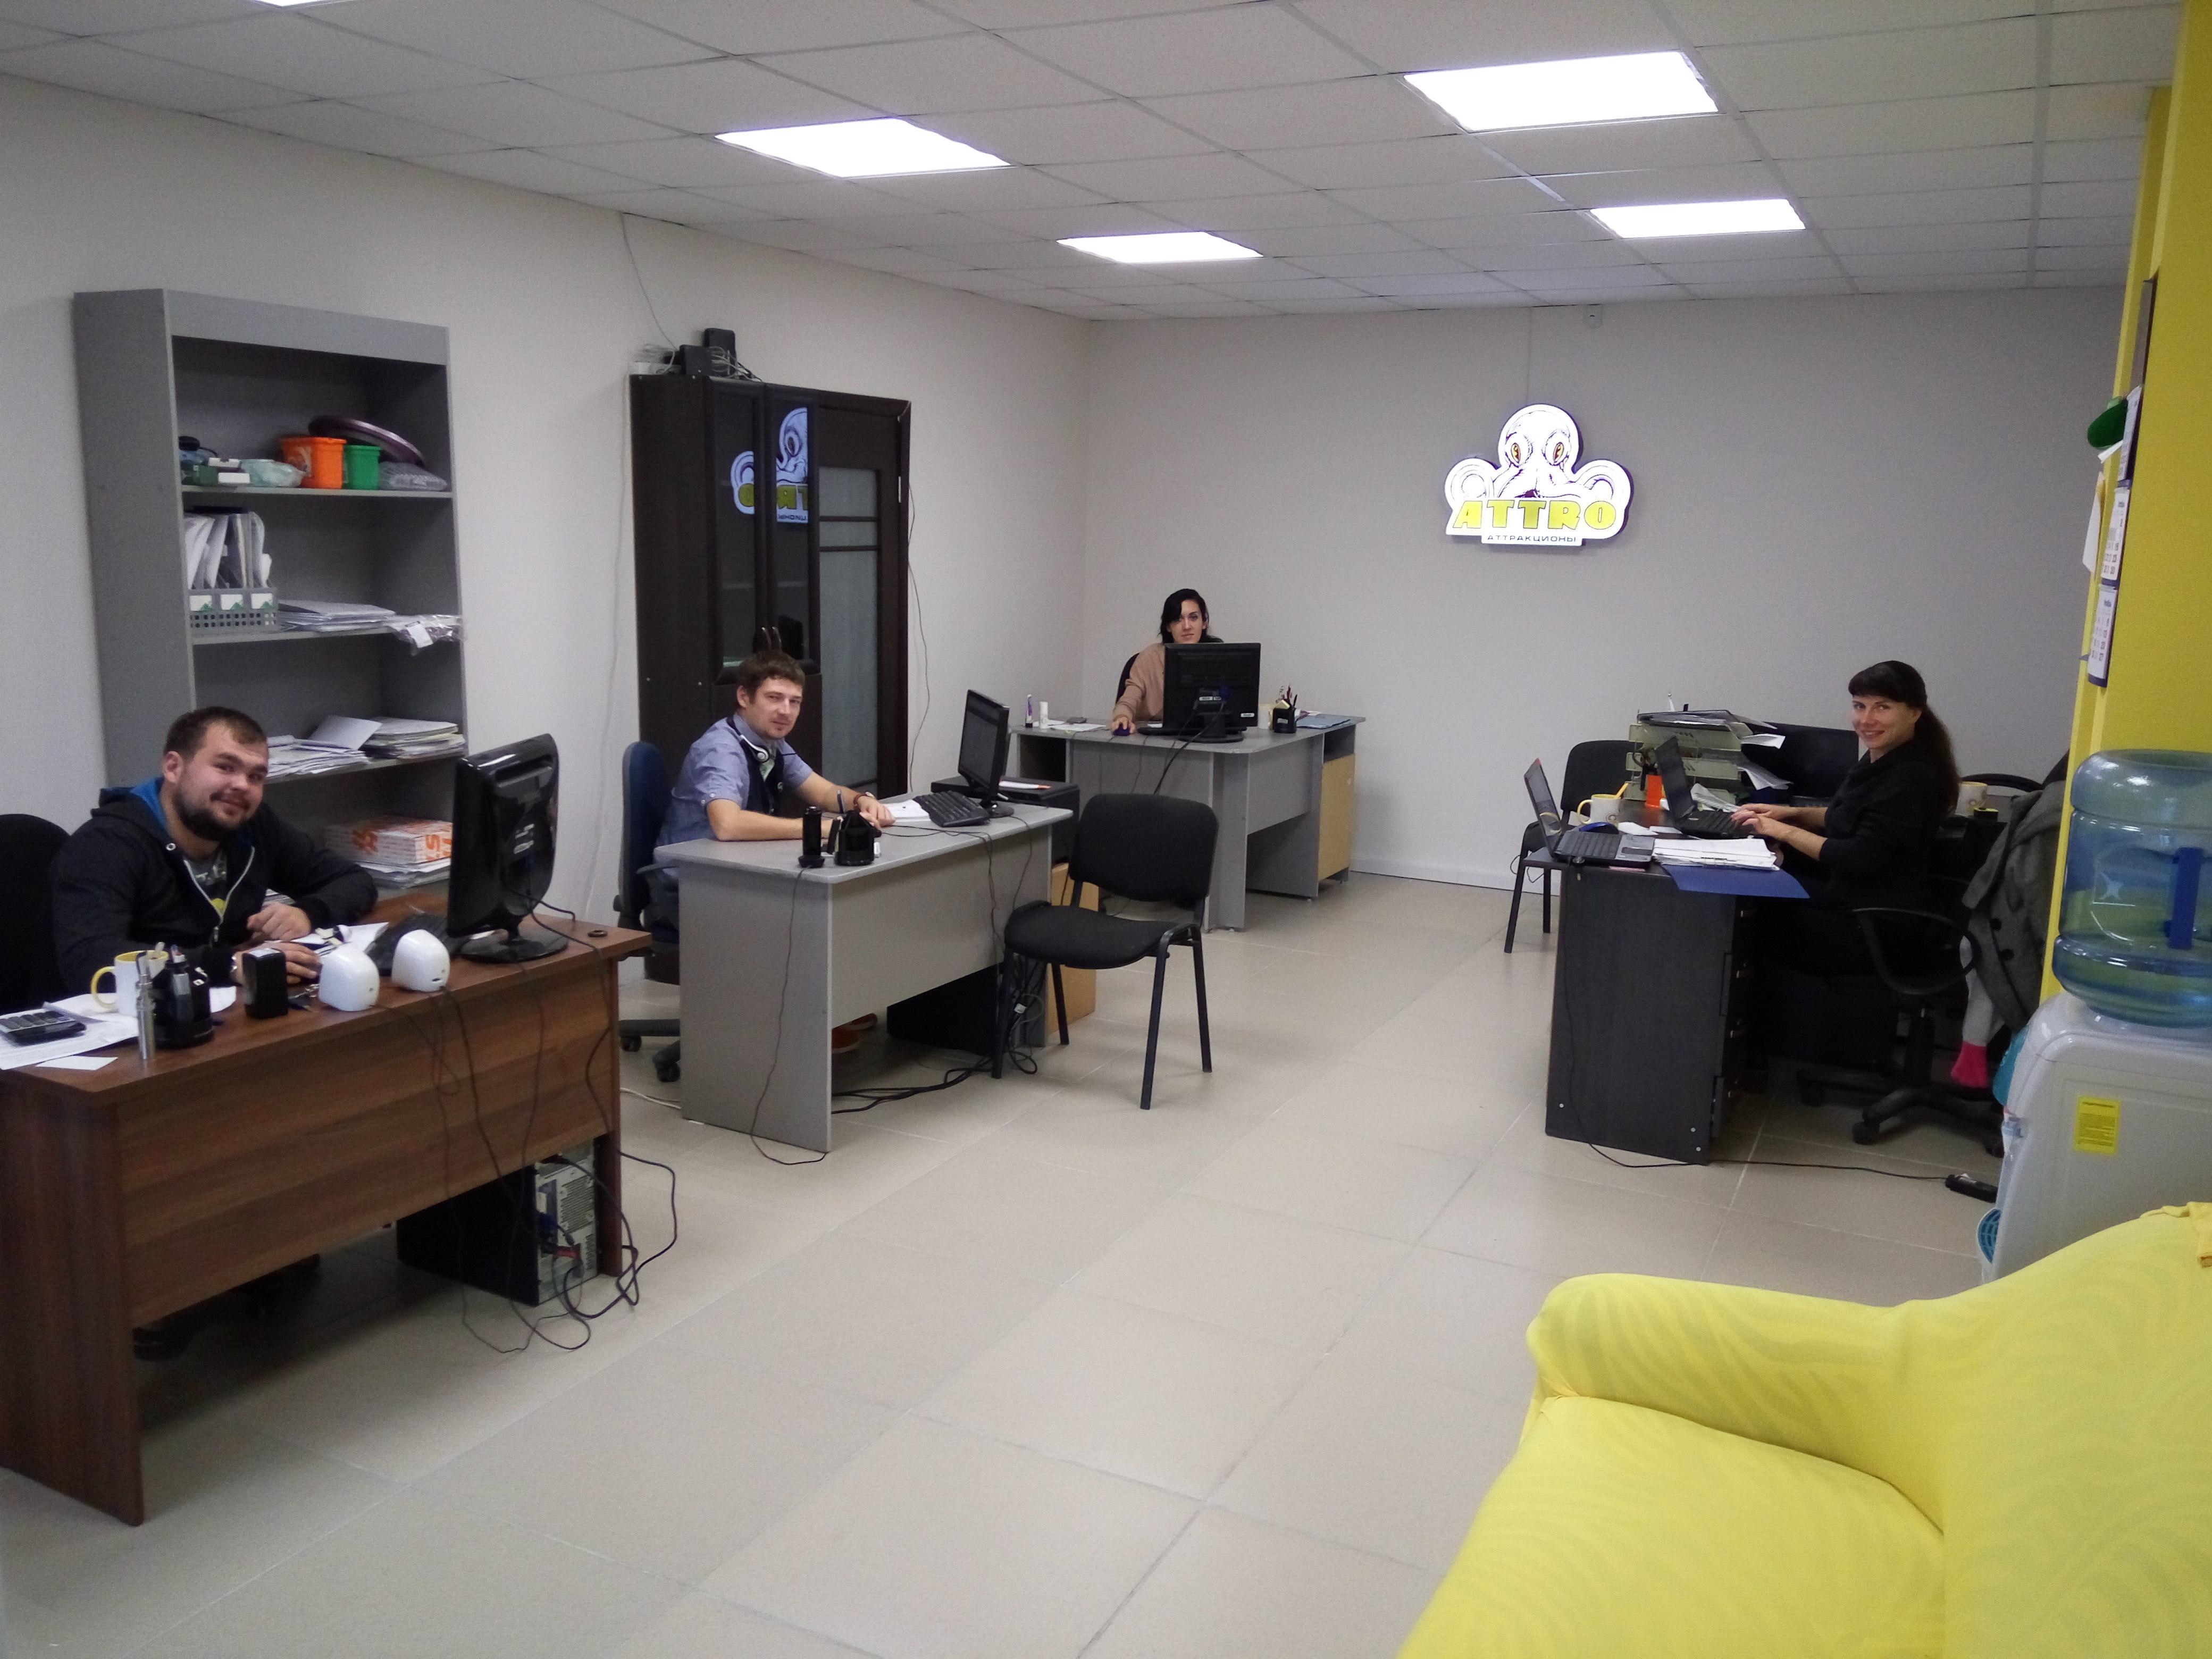 Офис компании ATTRO - Бейвеля 116